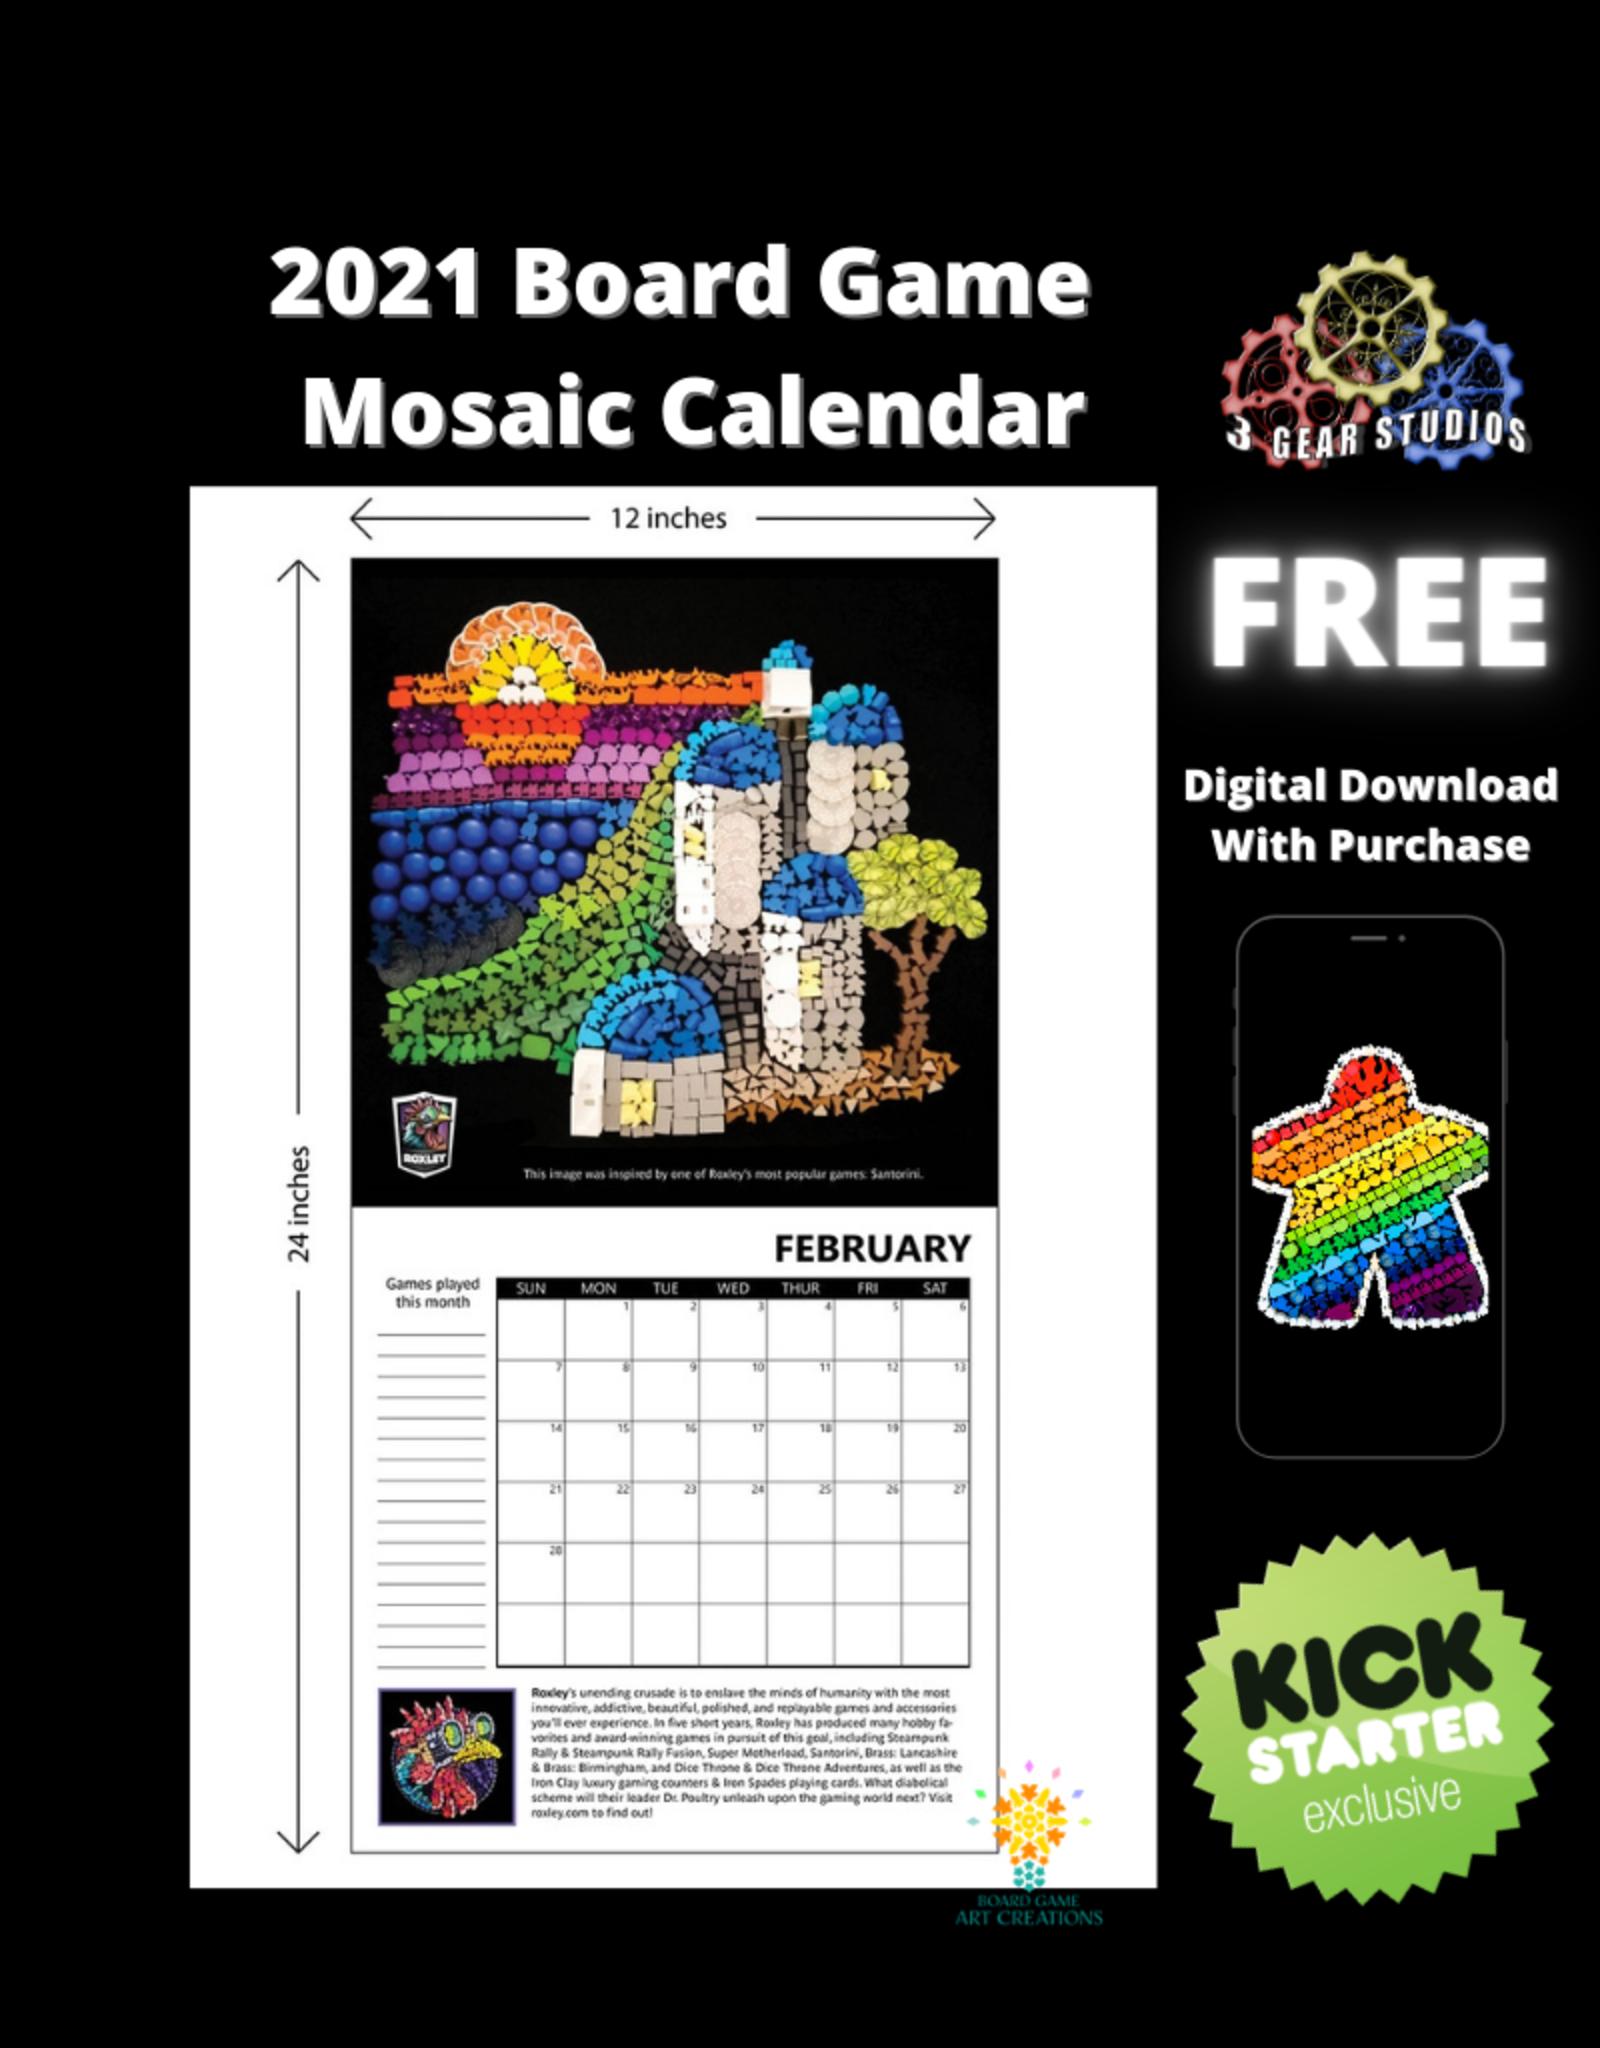 2021 Board Game Mosaic Calendar